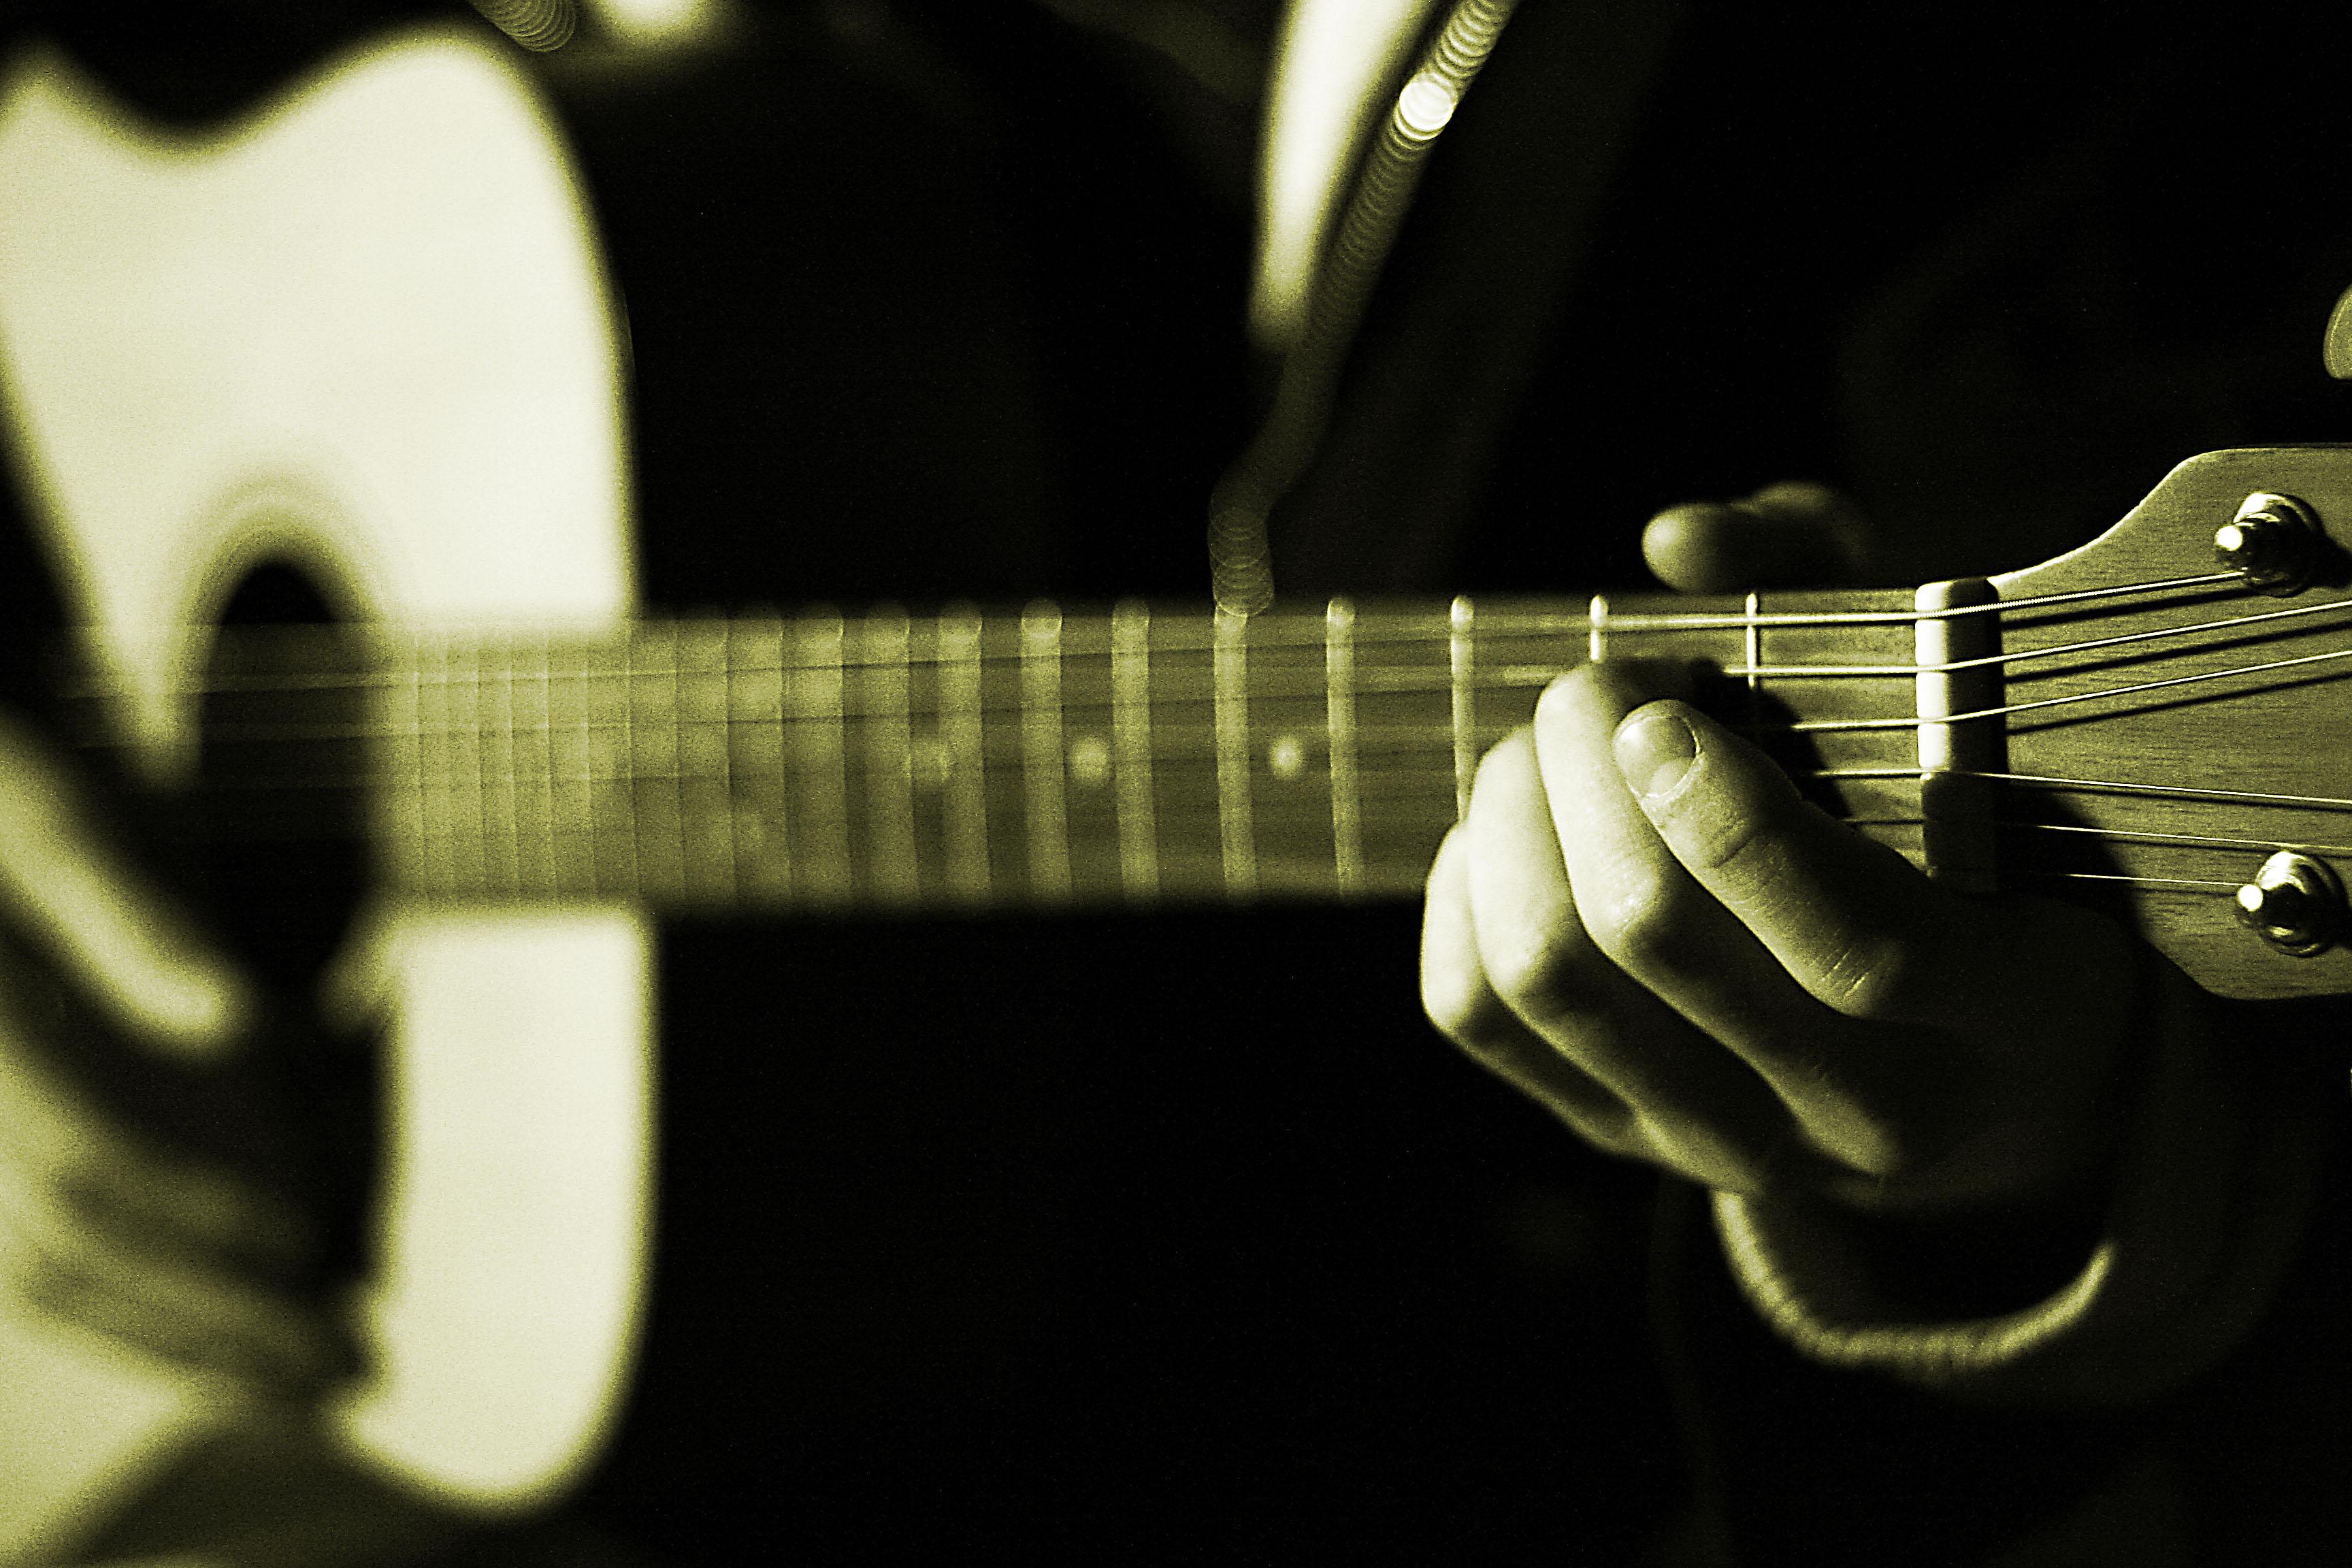 Chapter 1 Guitar Chord Matrix